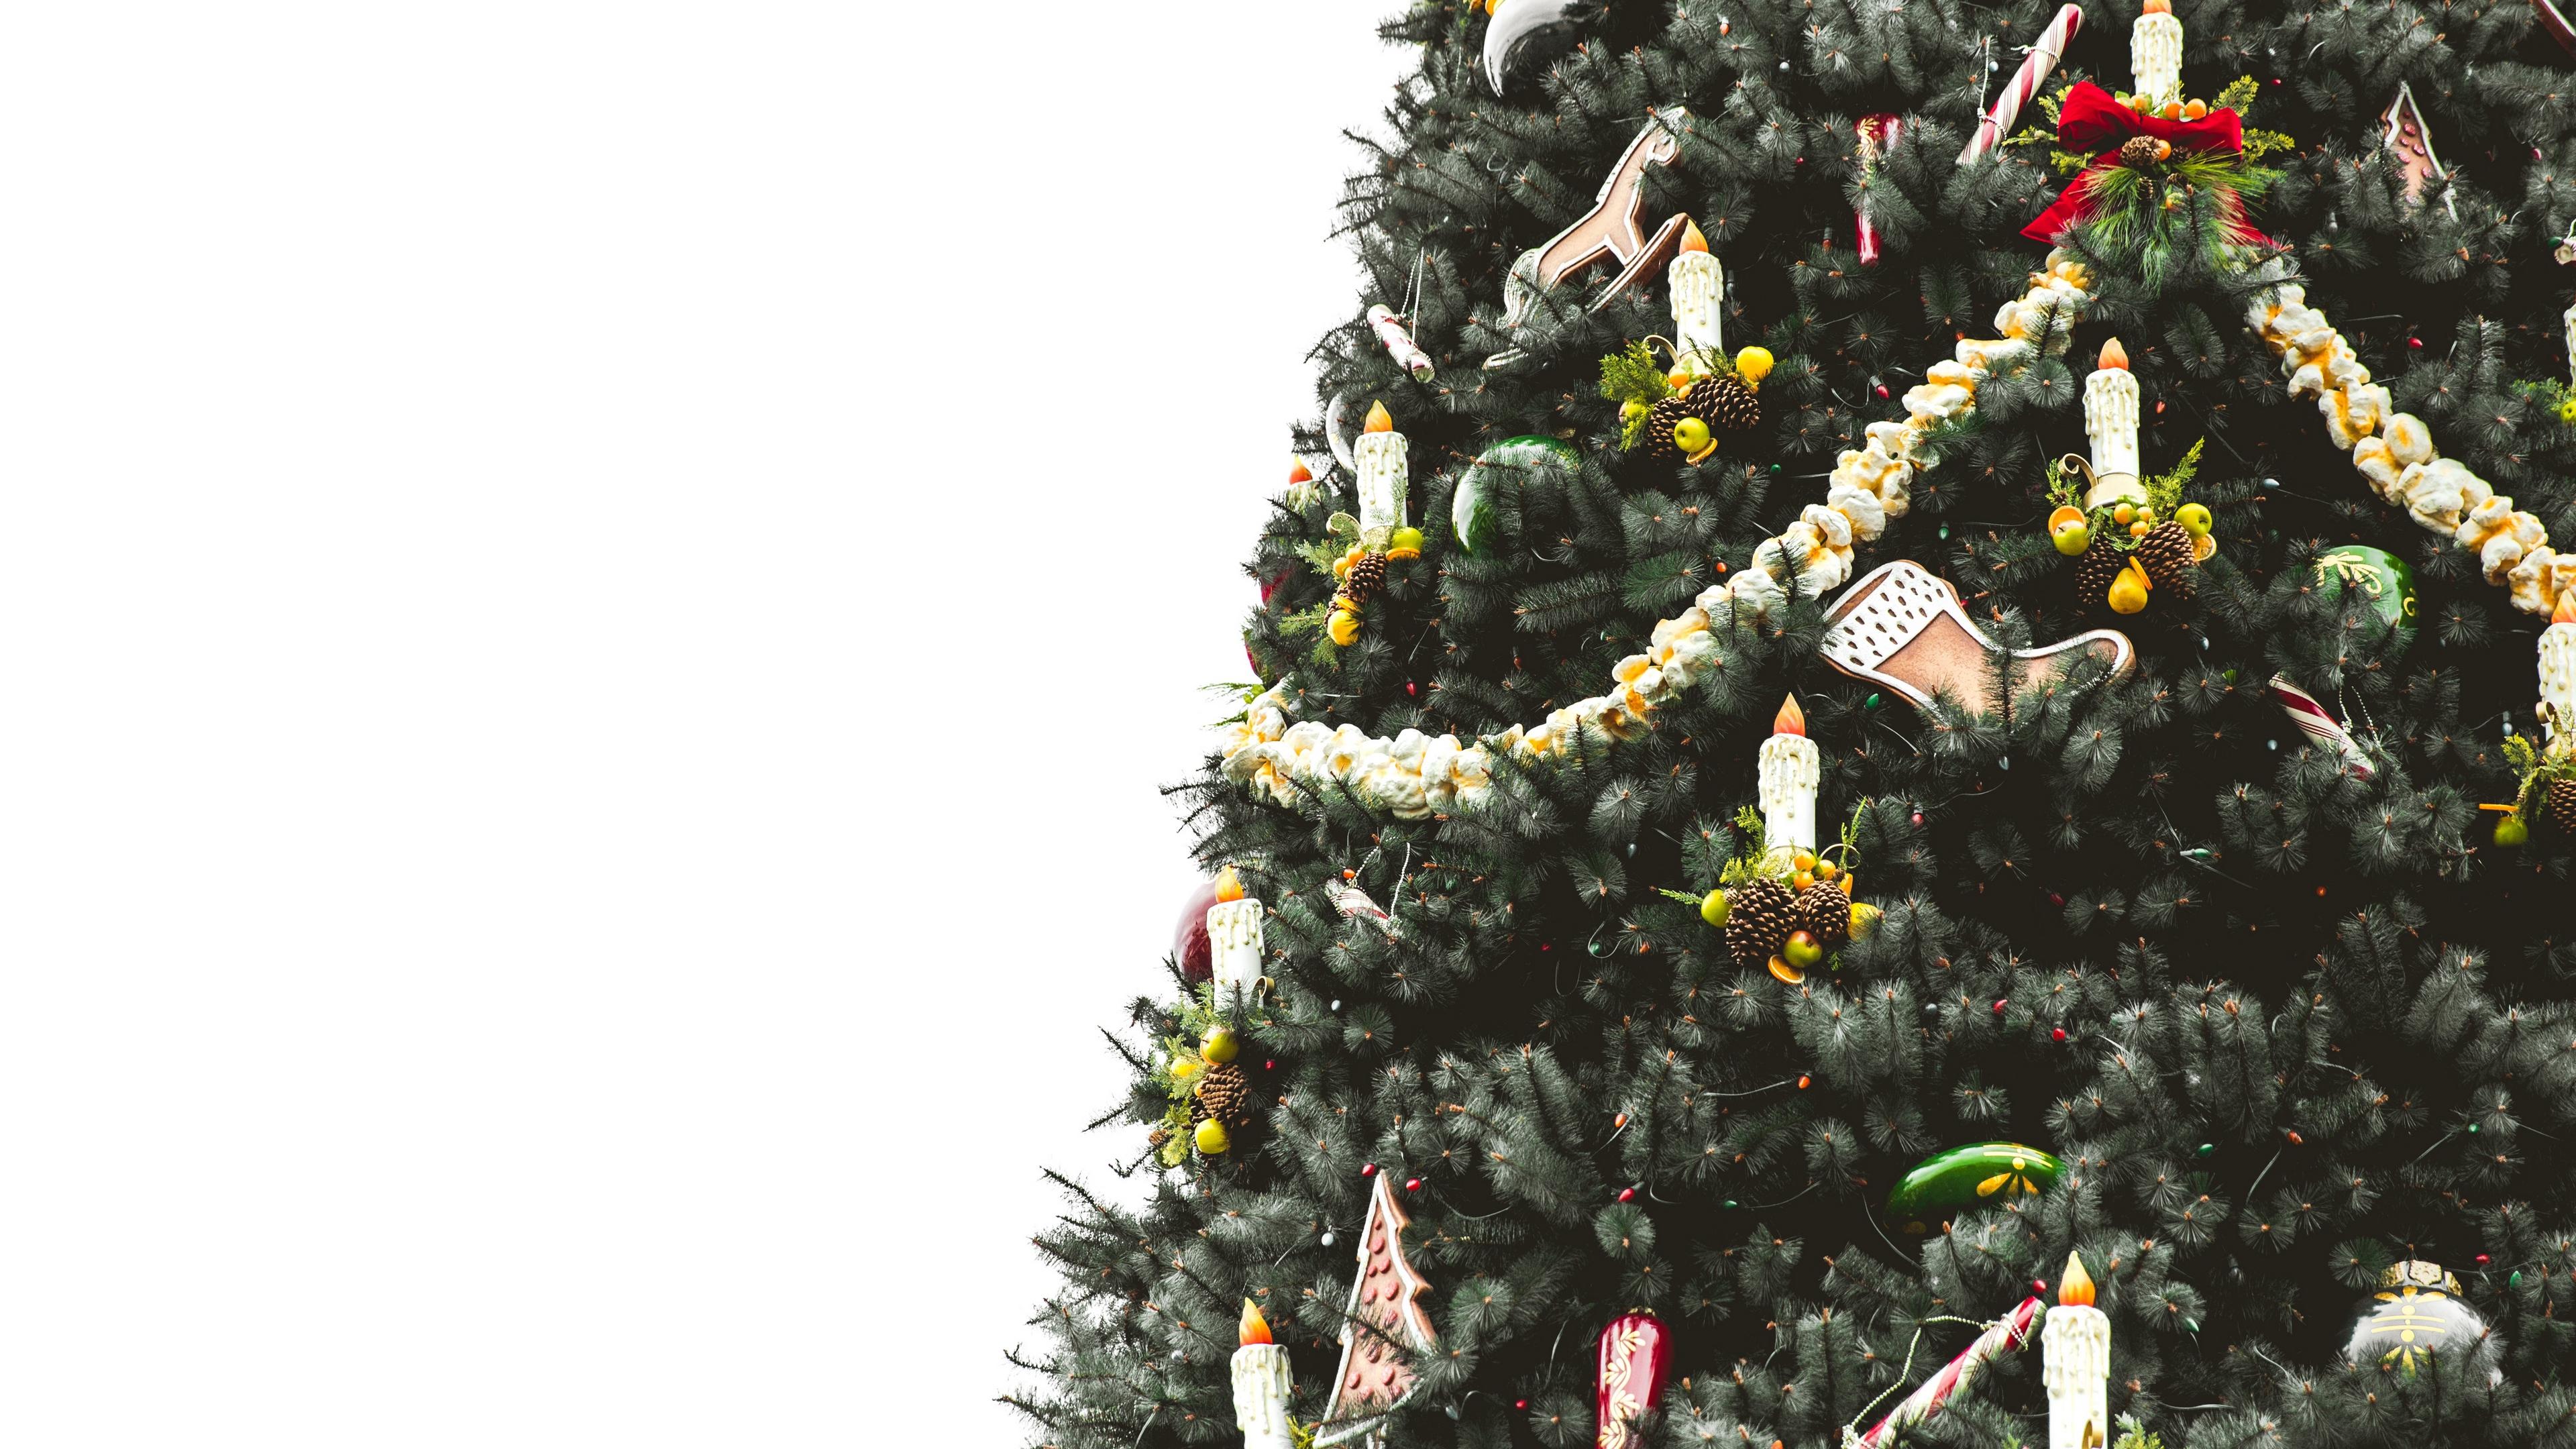 christmas tree ornaments candles 4k 1538344672 - christmas tree, ornaments, candles 4k - ornaments, christmas tree, Candles